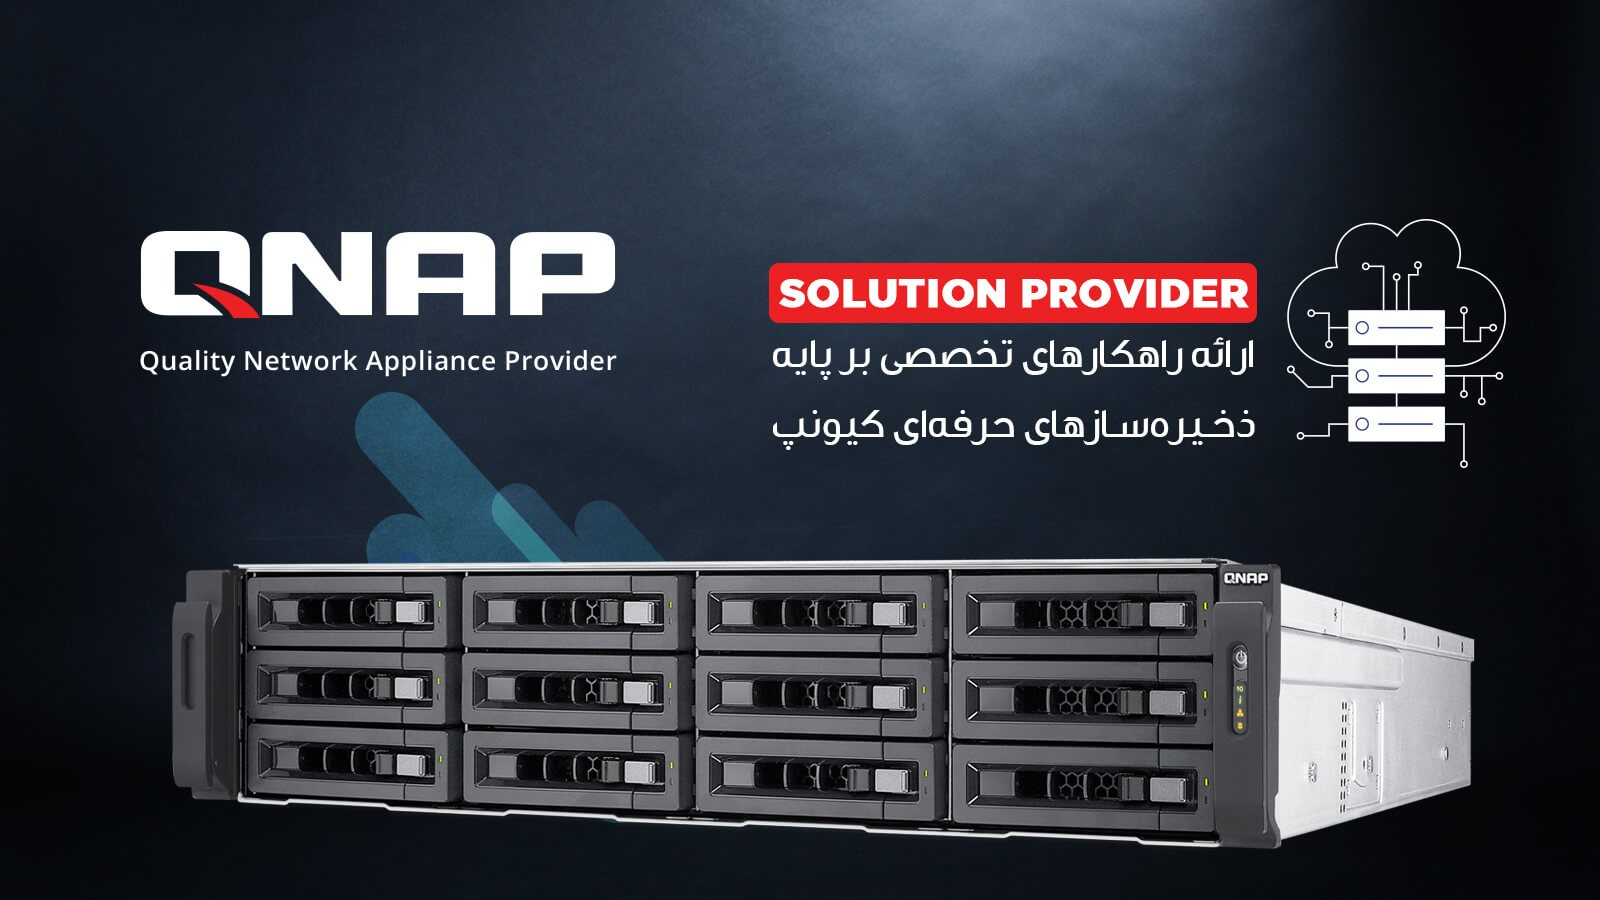 q2 - فروش کیونپ QNAP - فروشگاه  کامپیوتر رای نگار - نمایندگیQNAP-ASROCK-EnGenius-Cisco-HP-Seagate-MikroTik